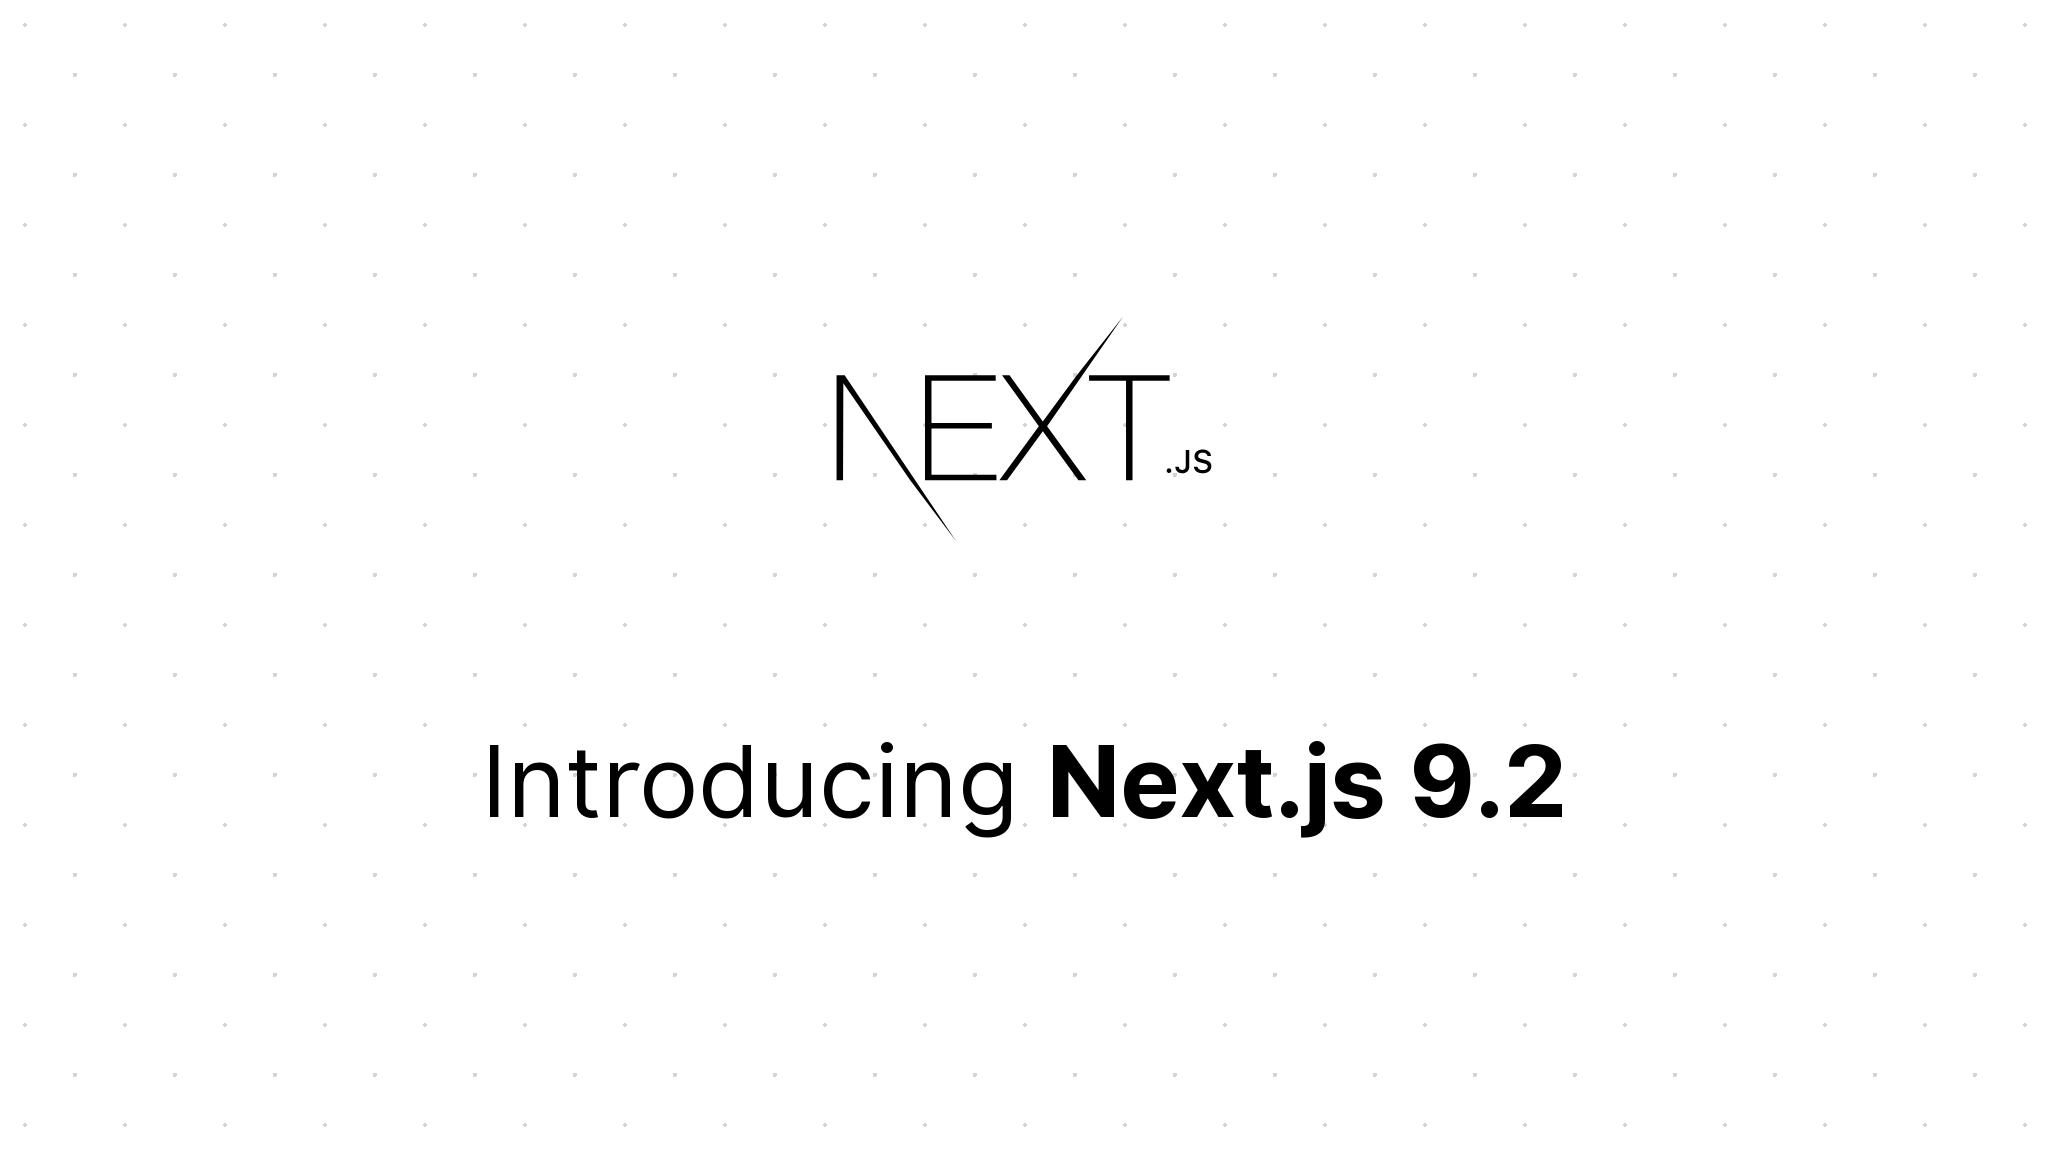 Next.js 9.2